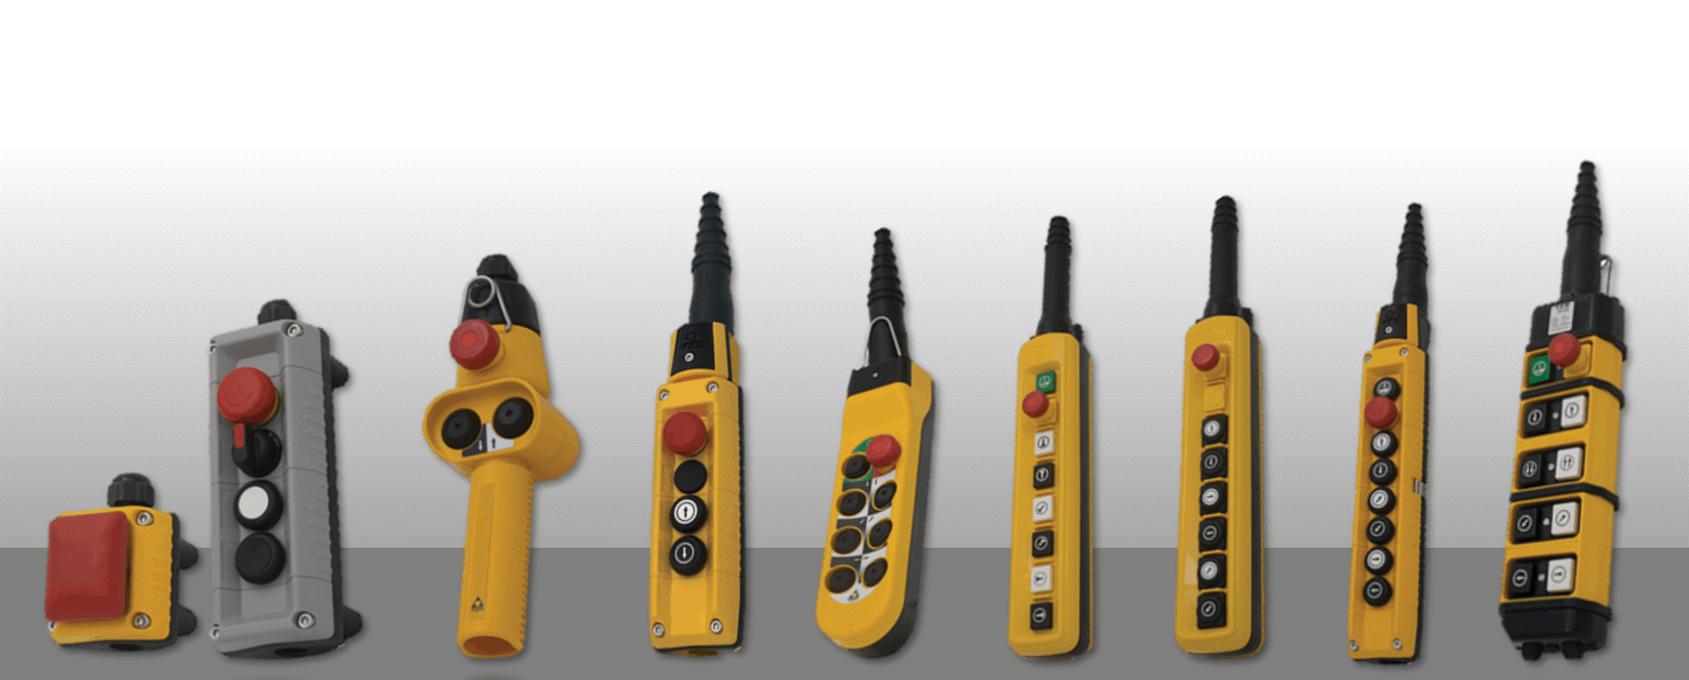 Pendant-control-stations-Produktübersicht